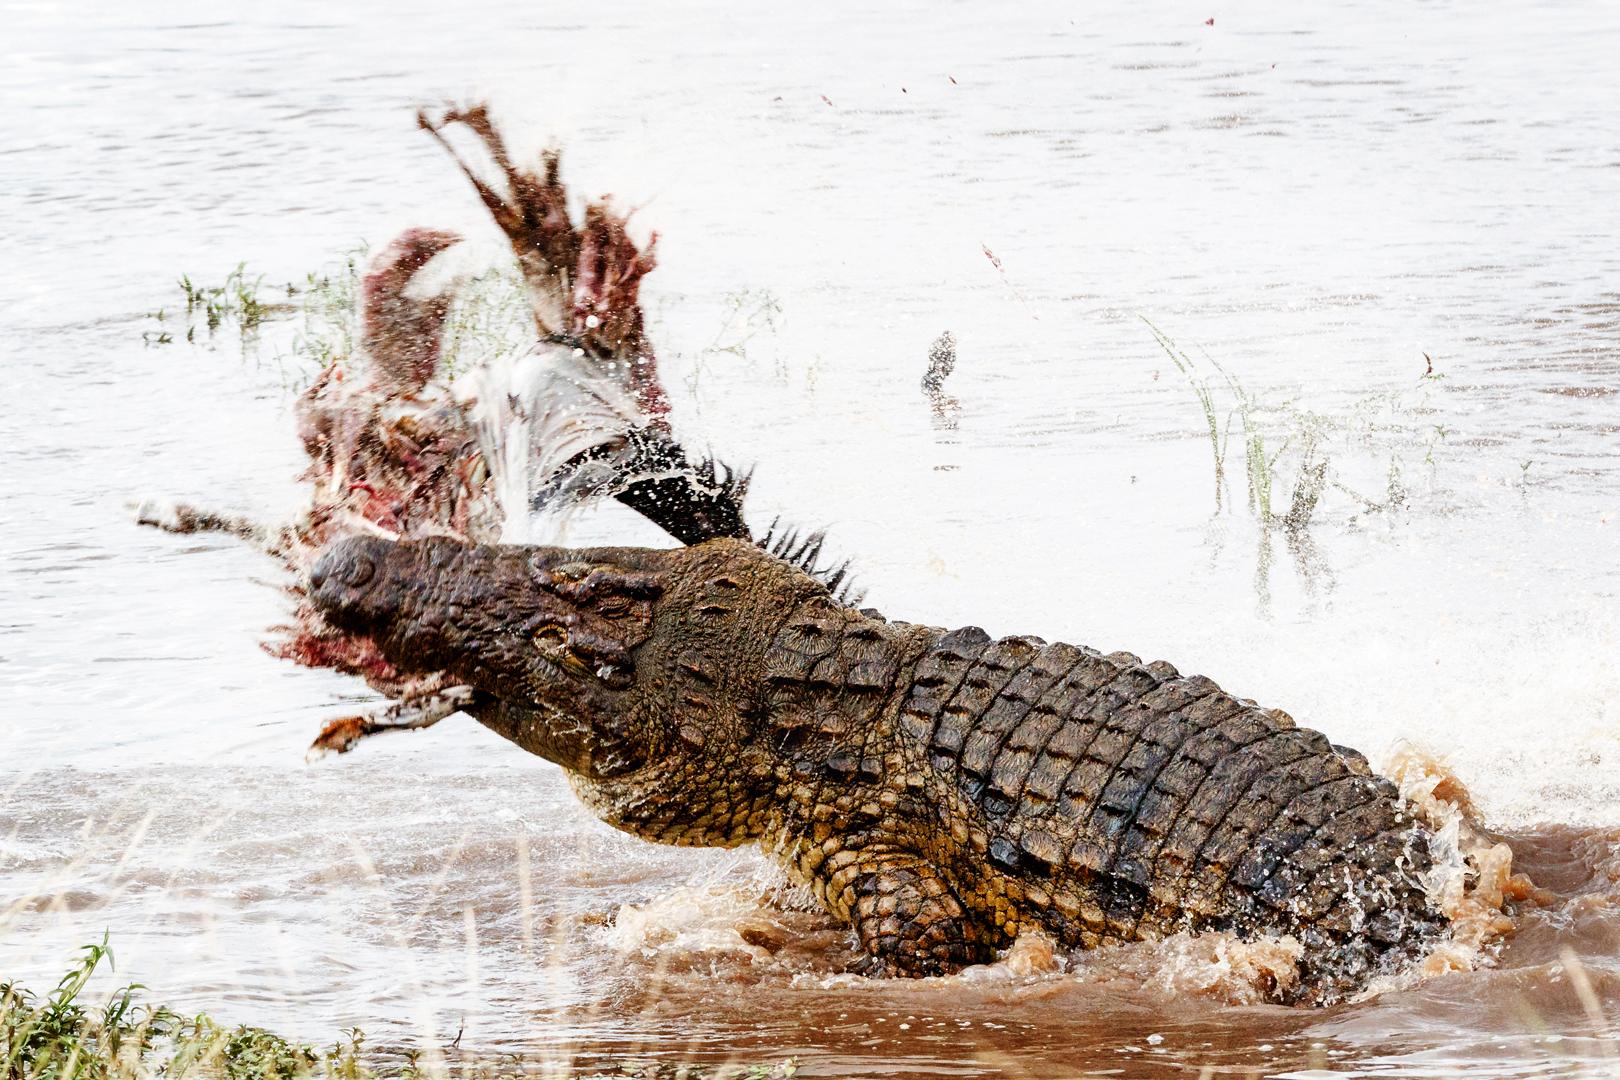 Nile Crocodile With Kill in Mara River.jpg